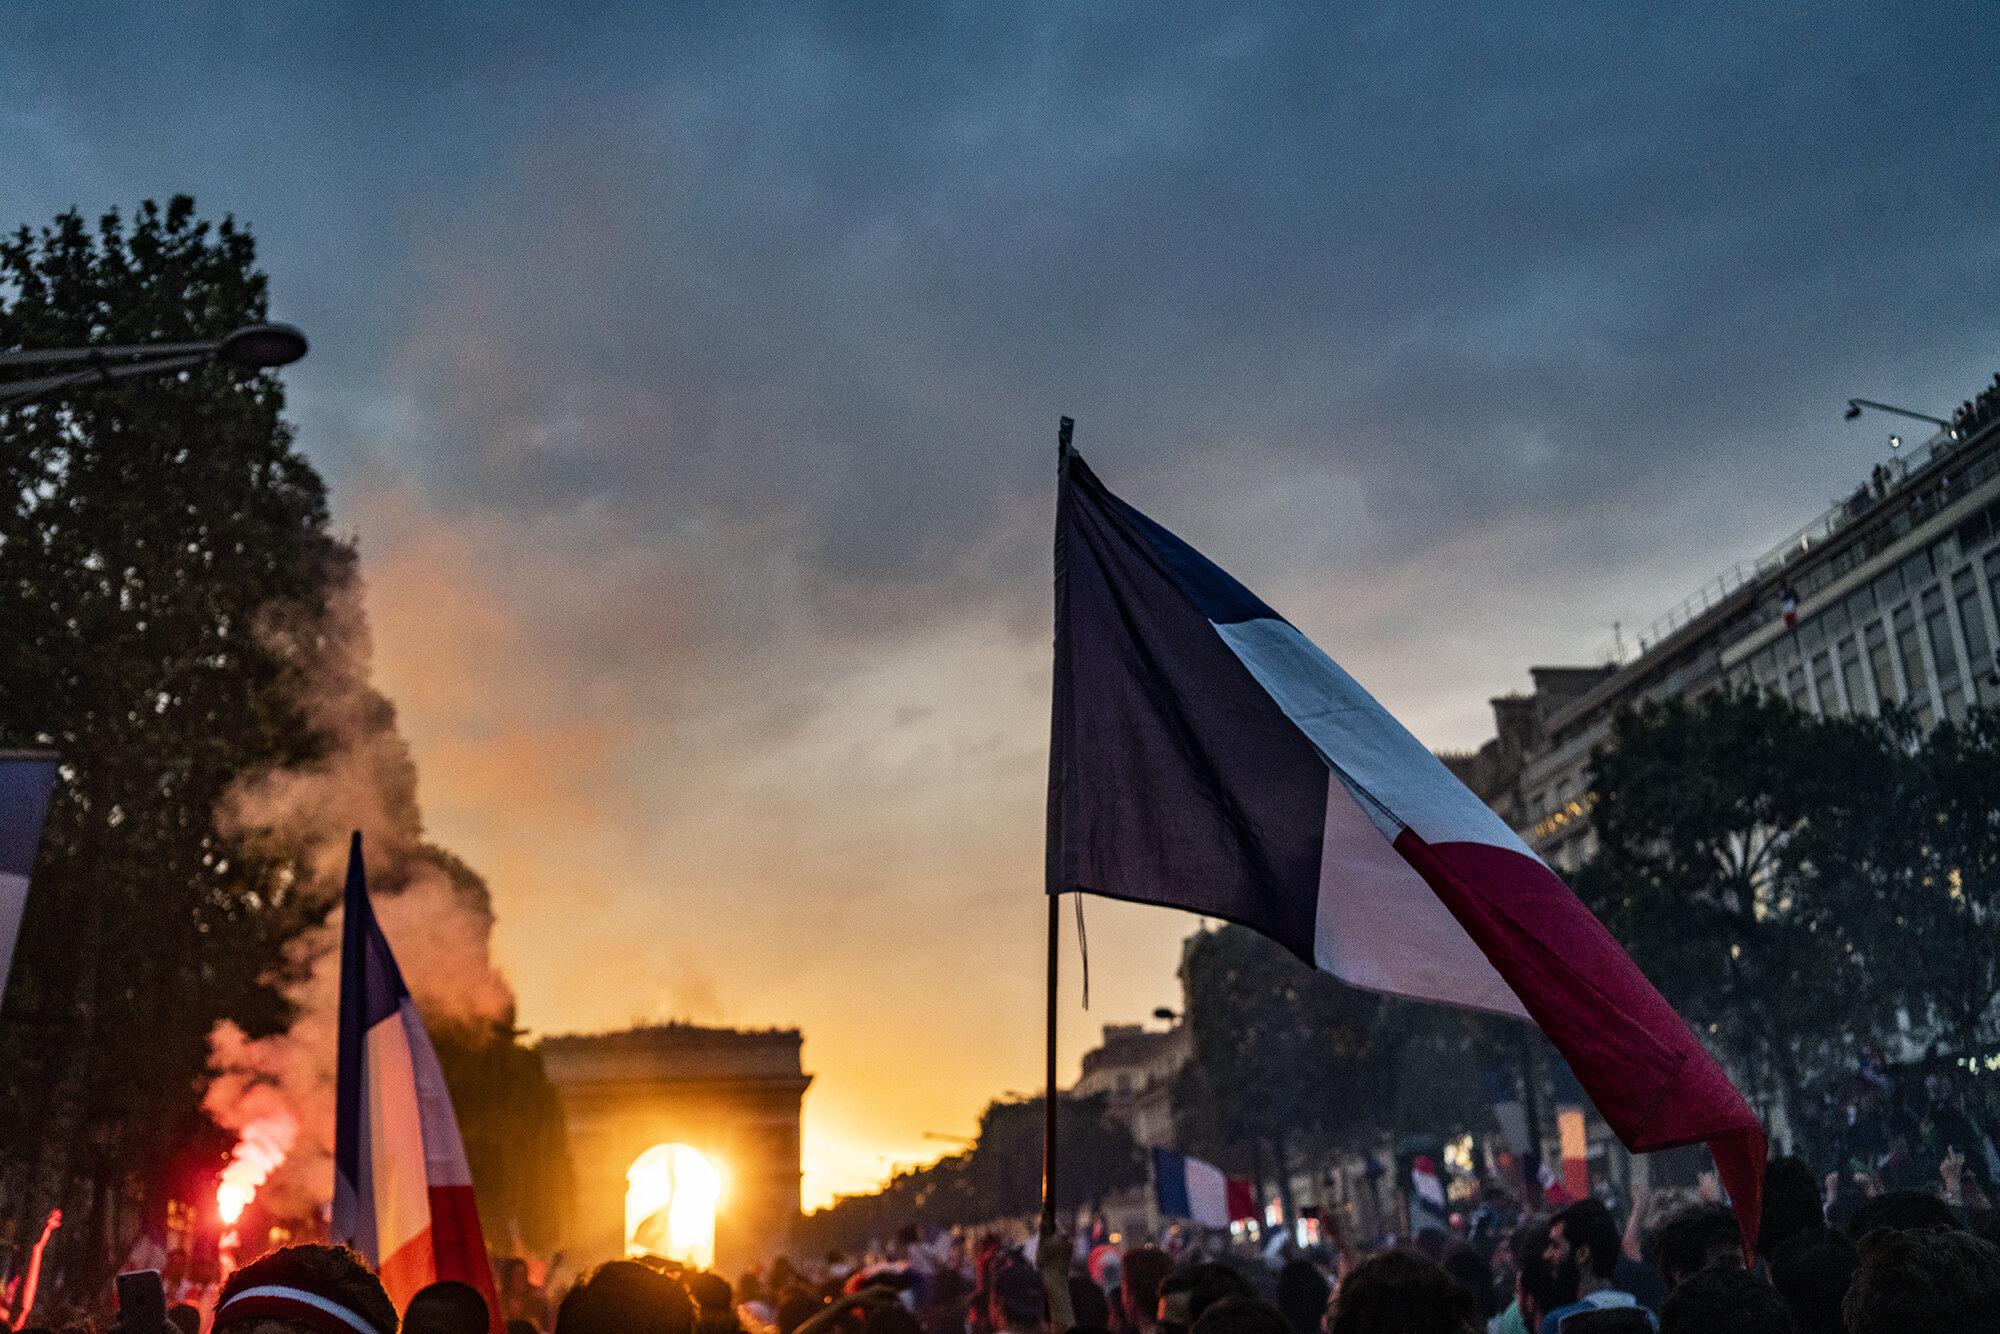 Paris_World_Cup_Celebration_2018-566.jpg